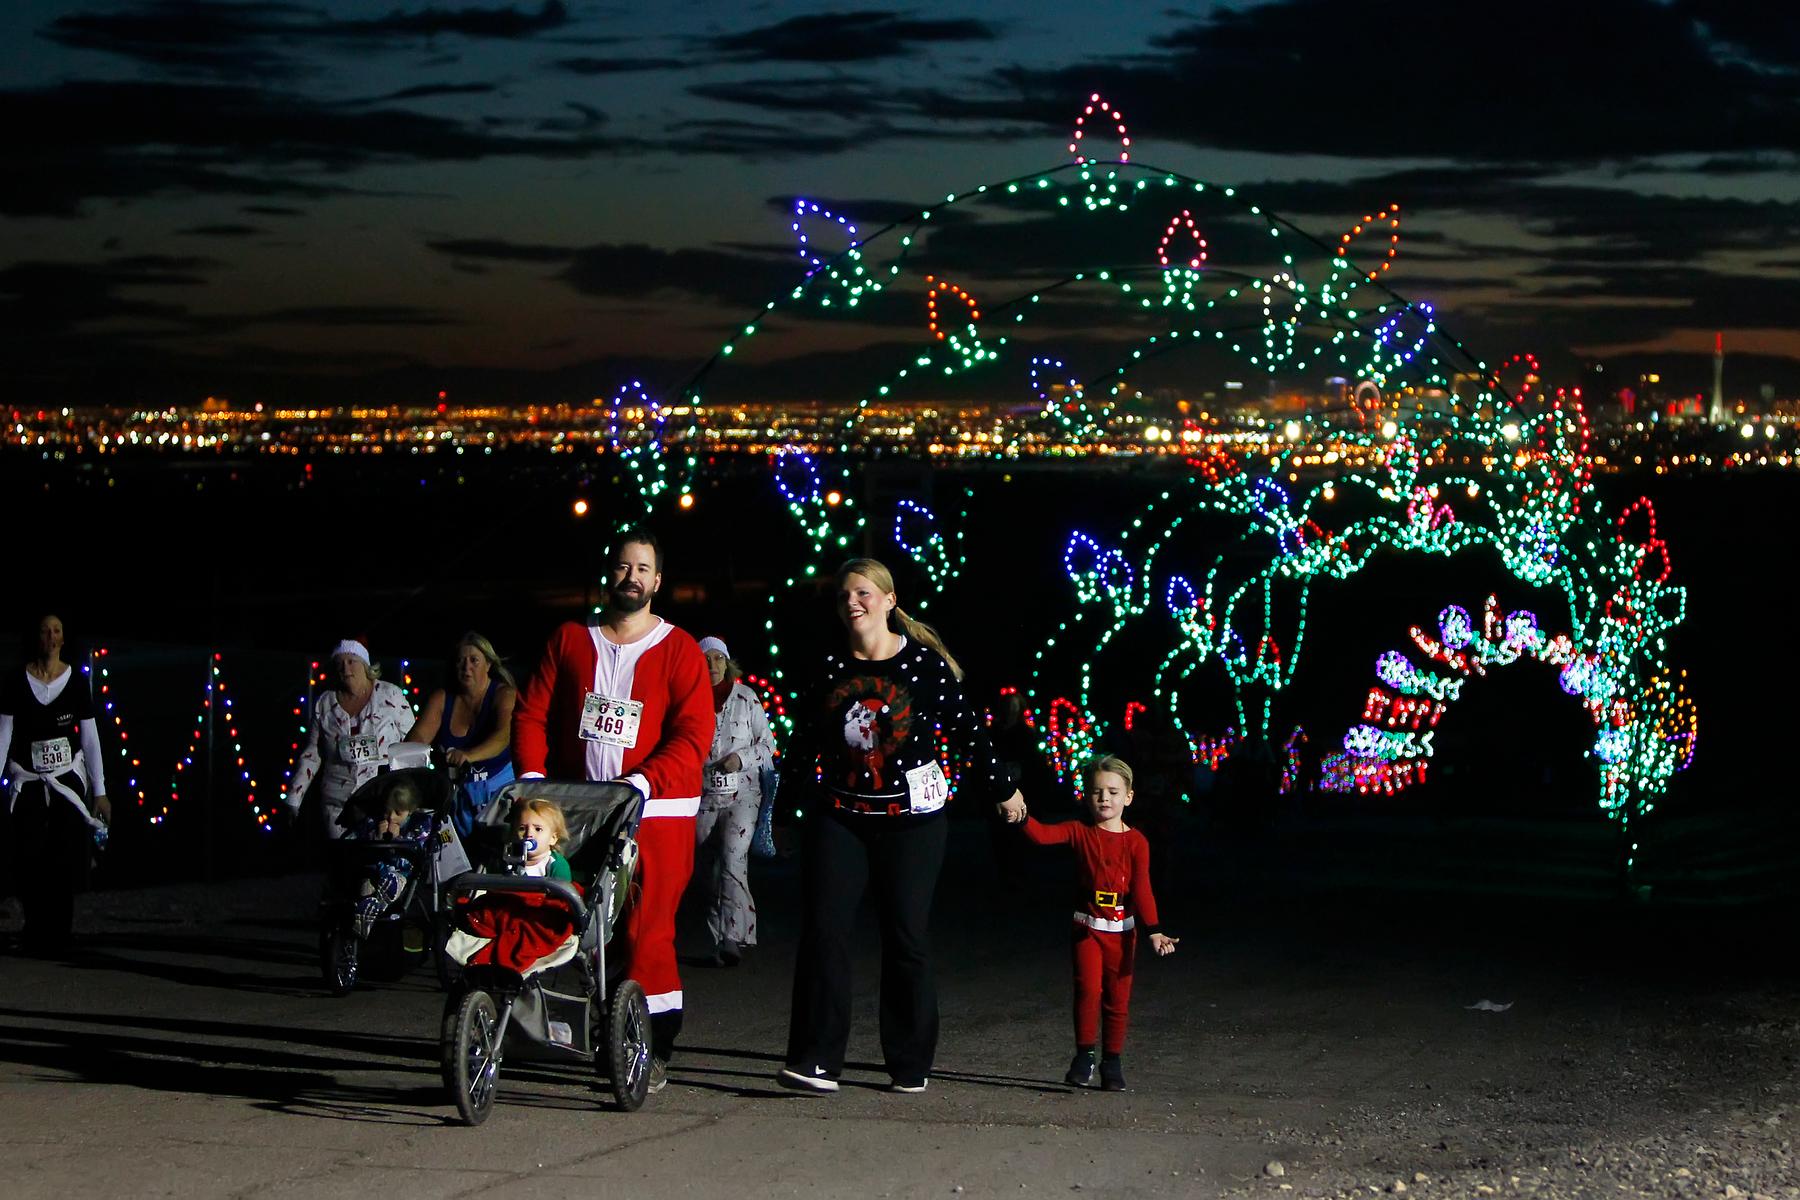 PJ 5K Run & 1 Mile Walk through Glittering Lights Las Vegas NV